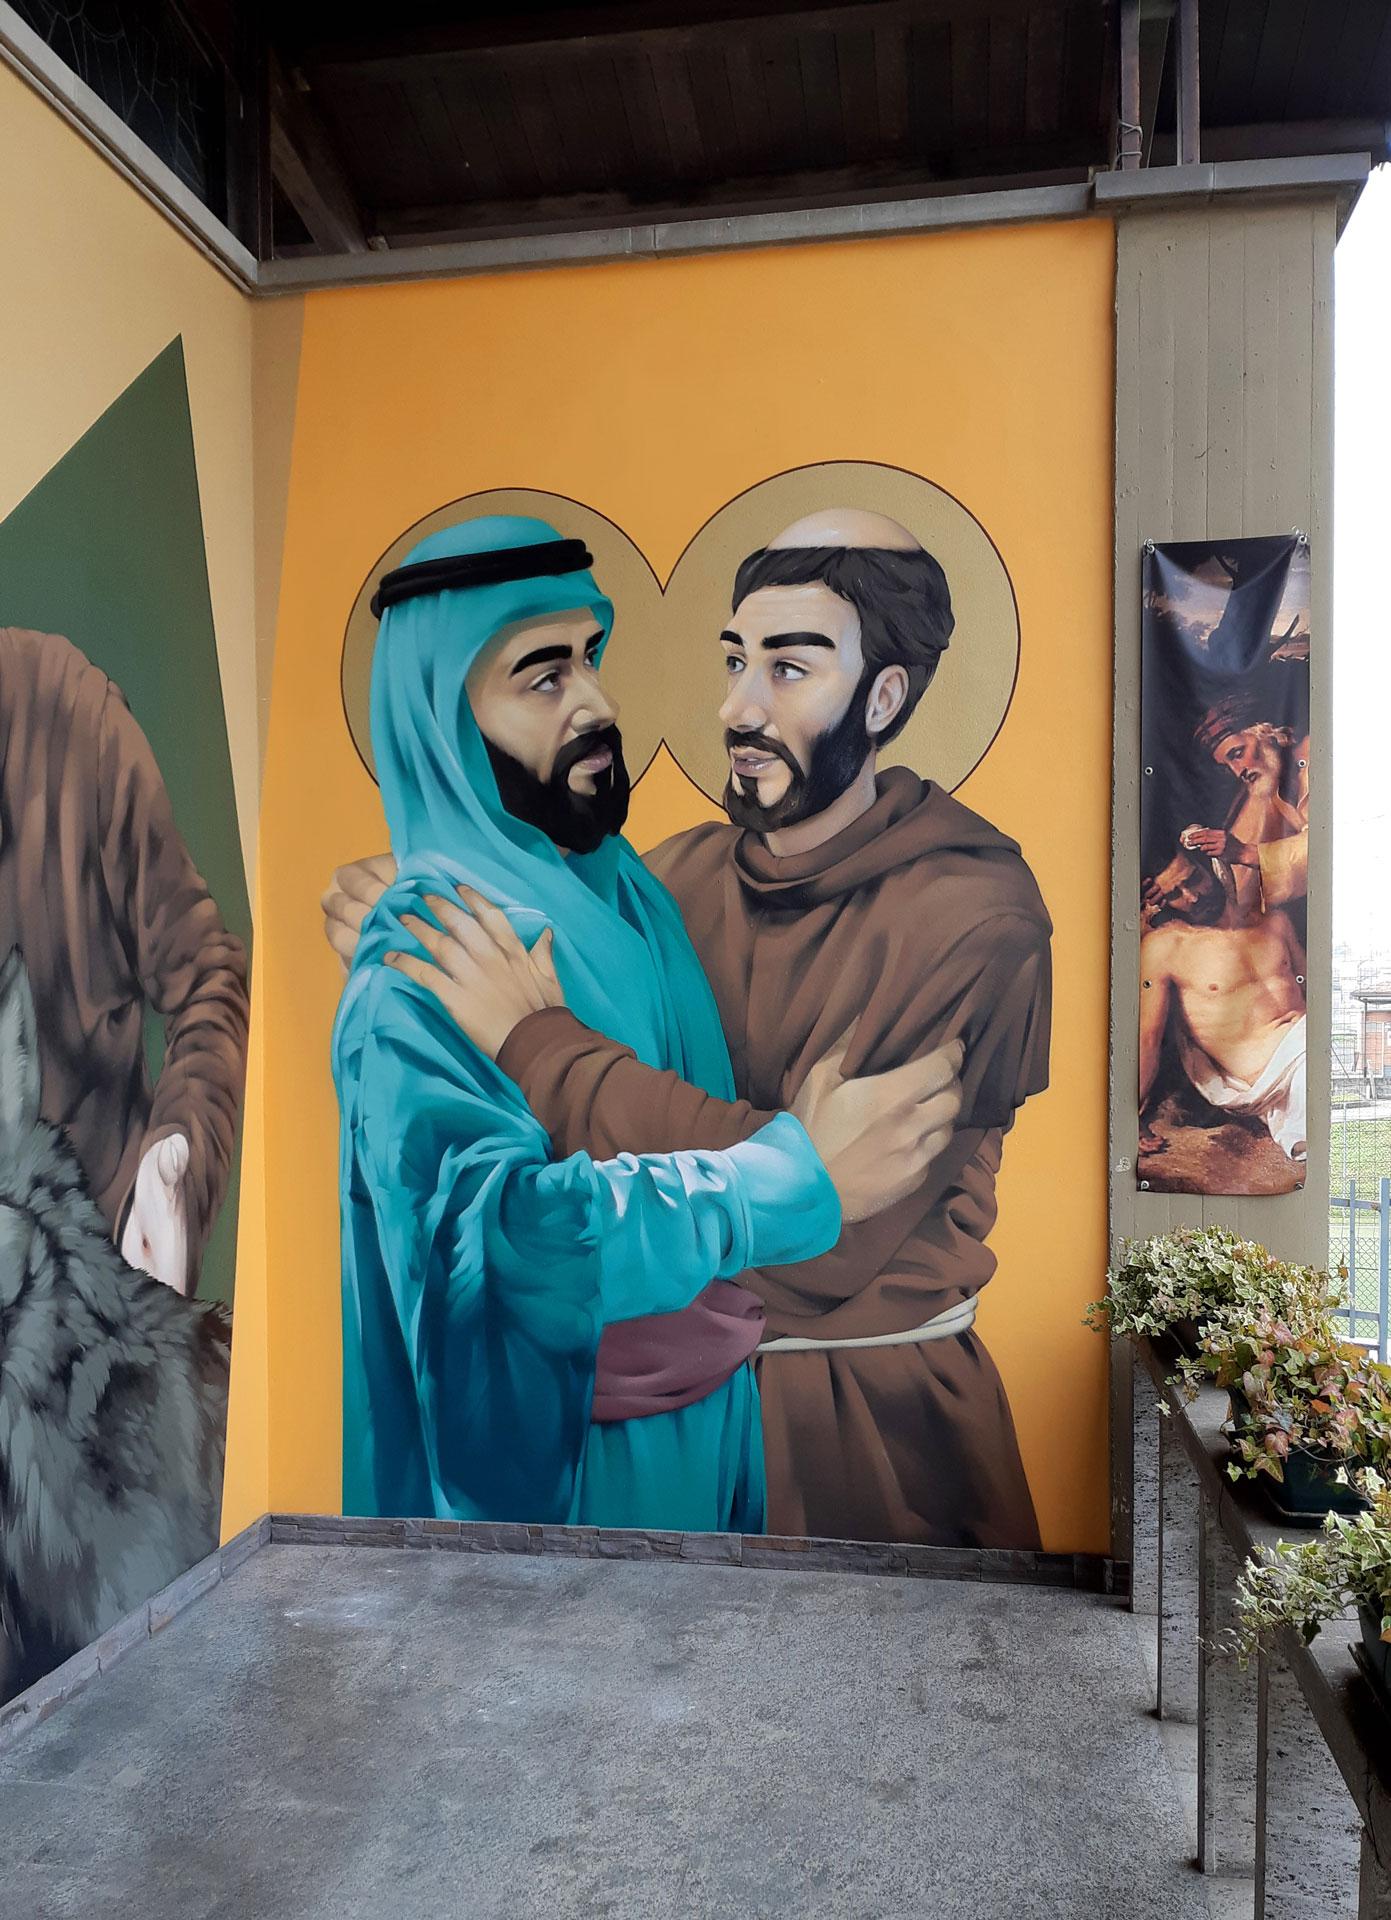 San-Francesco-e-Saladino,-Treviglio-(BG),-2018